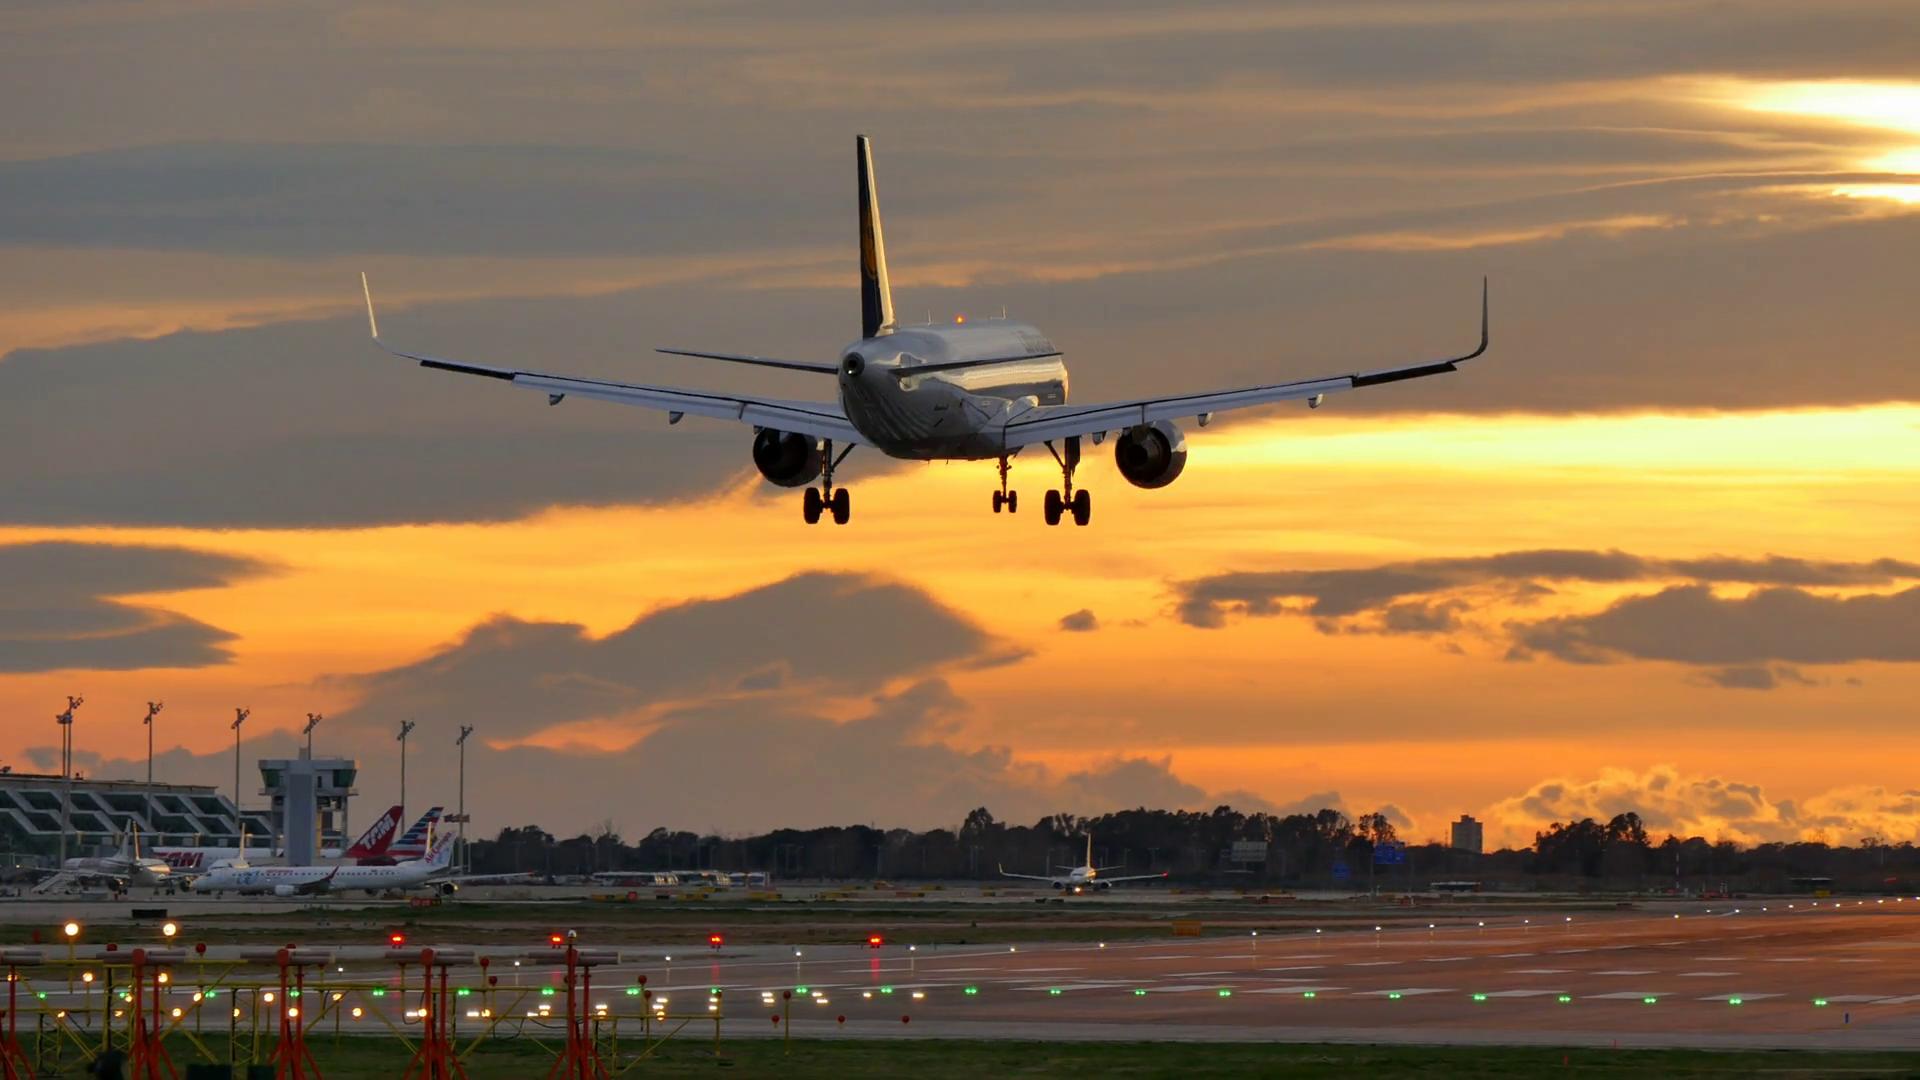 Jetliner landing photo